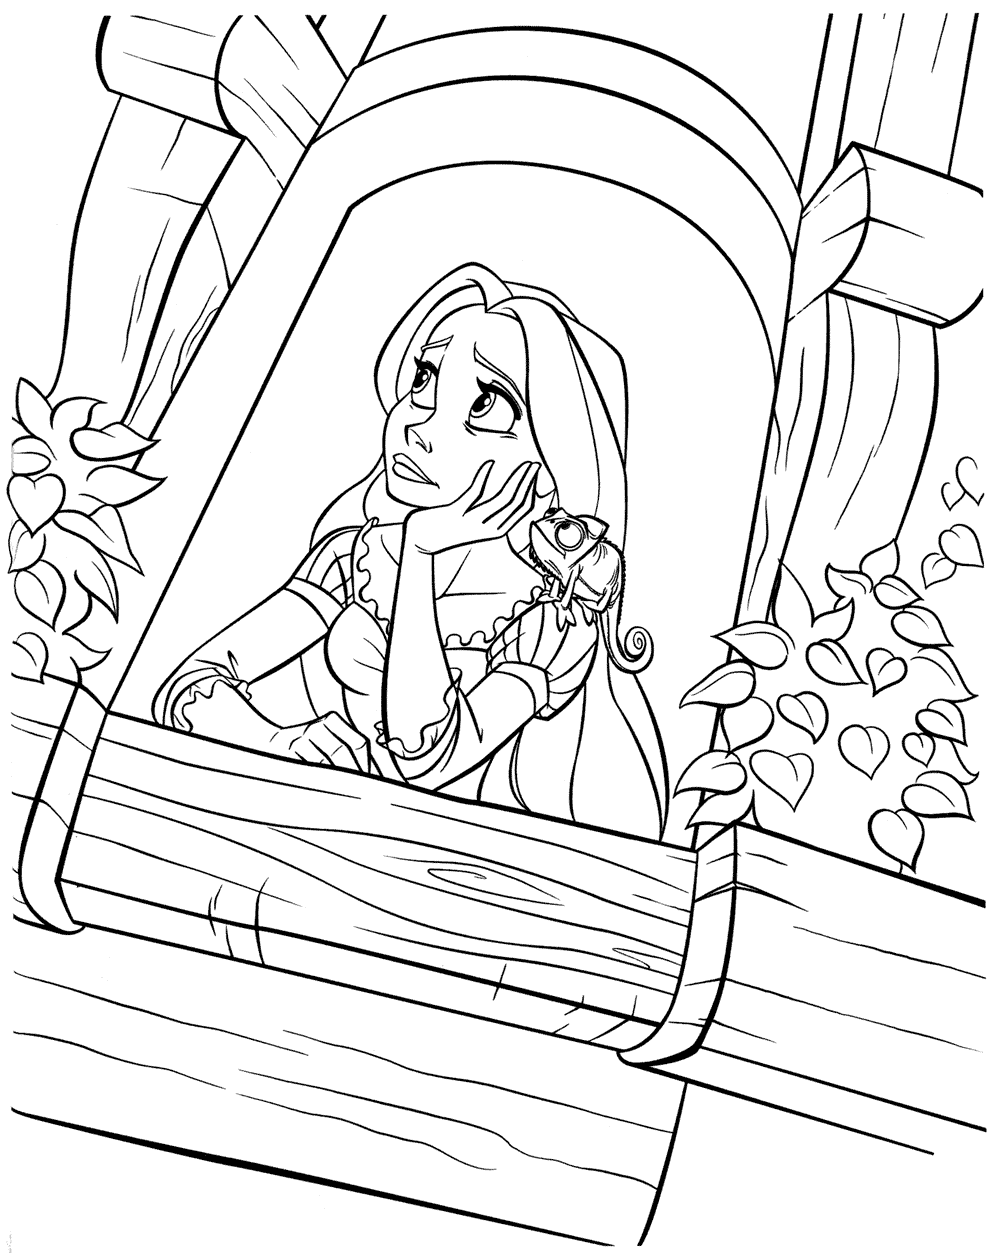 Pinta A Rapunzel 2 A Magia Da Disney